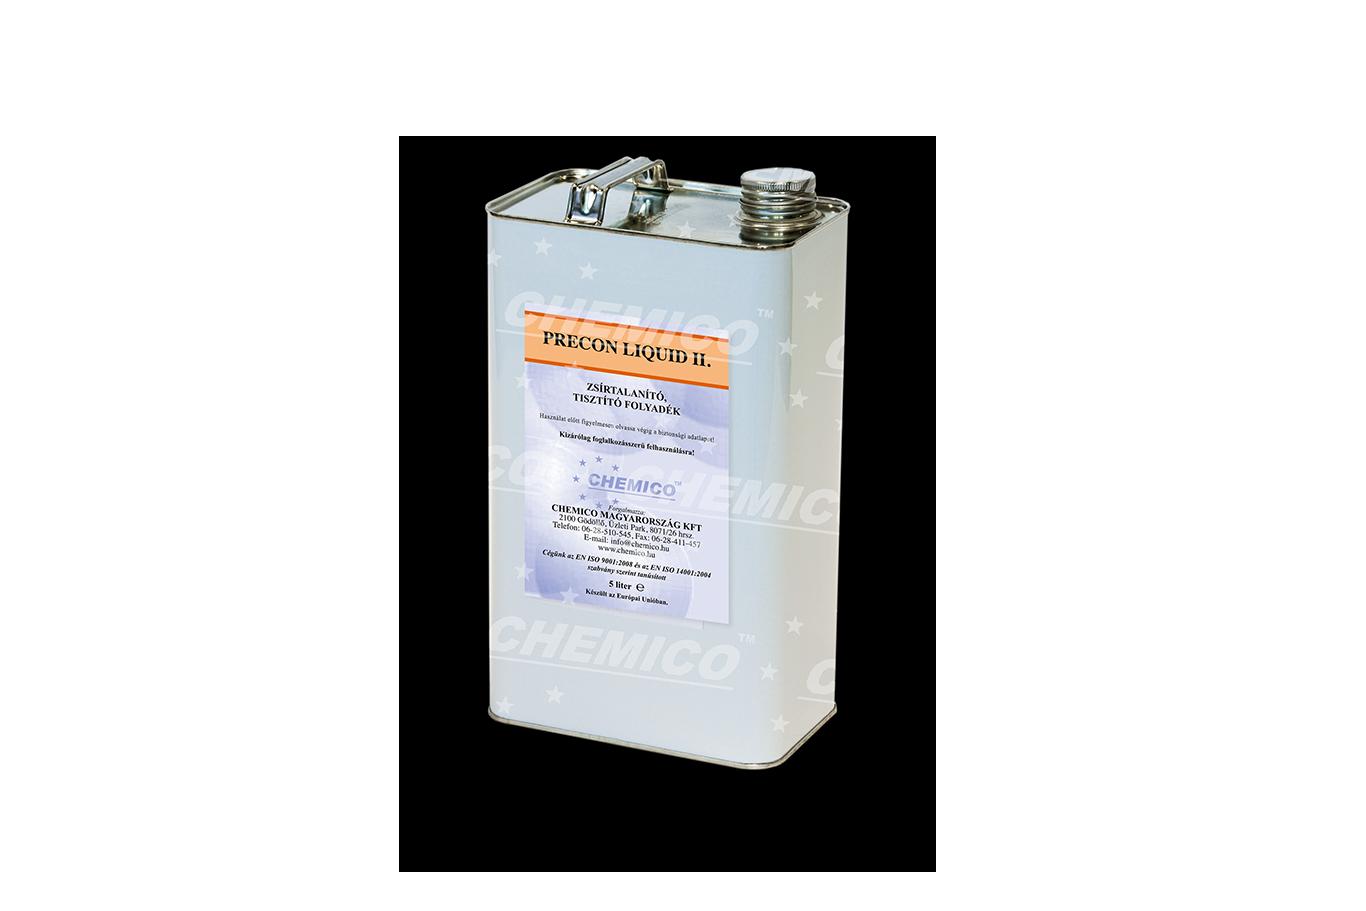 precon-liquid-II-zsirtalanito-szerves-oldoszer-zsiroldo-alkatreszmoso-lassan-parolgo-alacsony-lobbanaspont-ipari-chemico-kanna